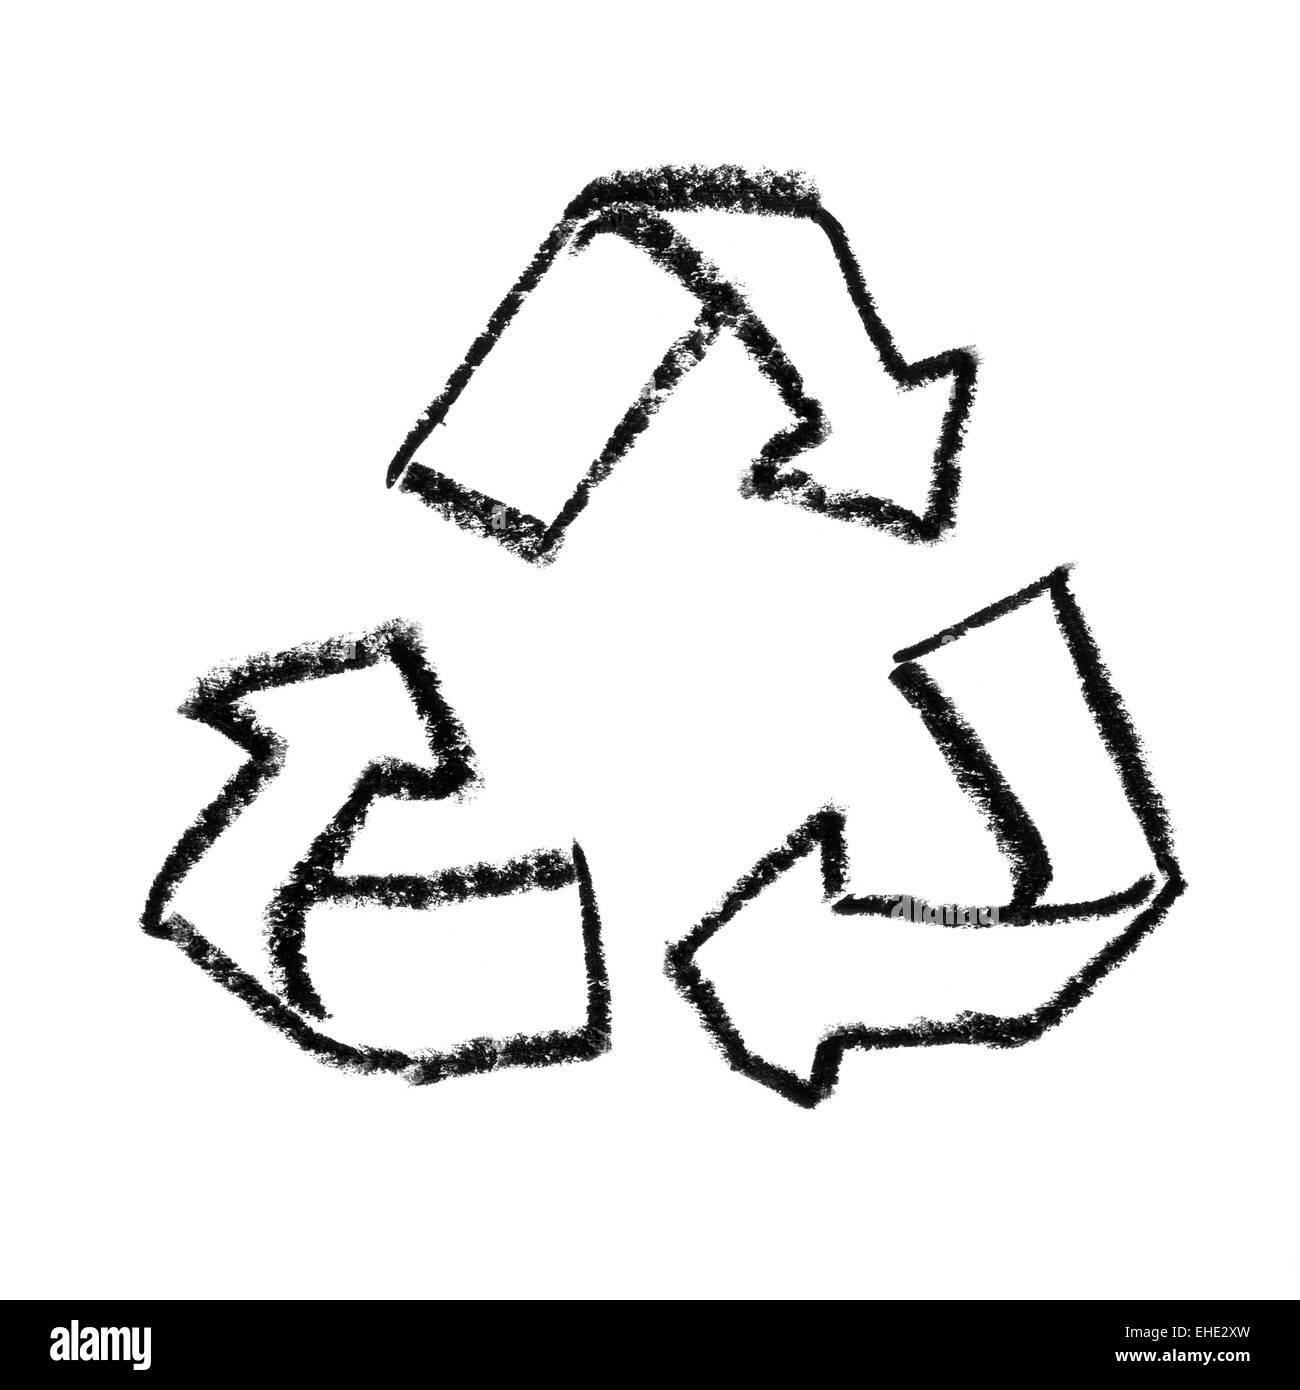 Reuse Symbol - Stock Image